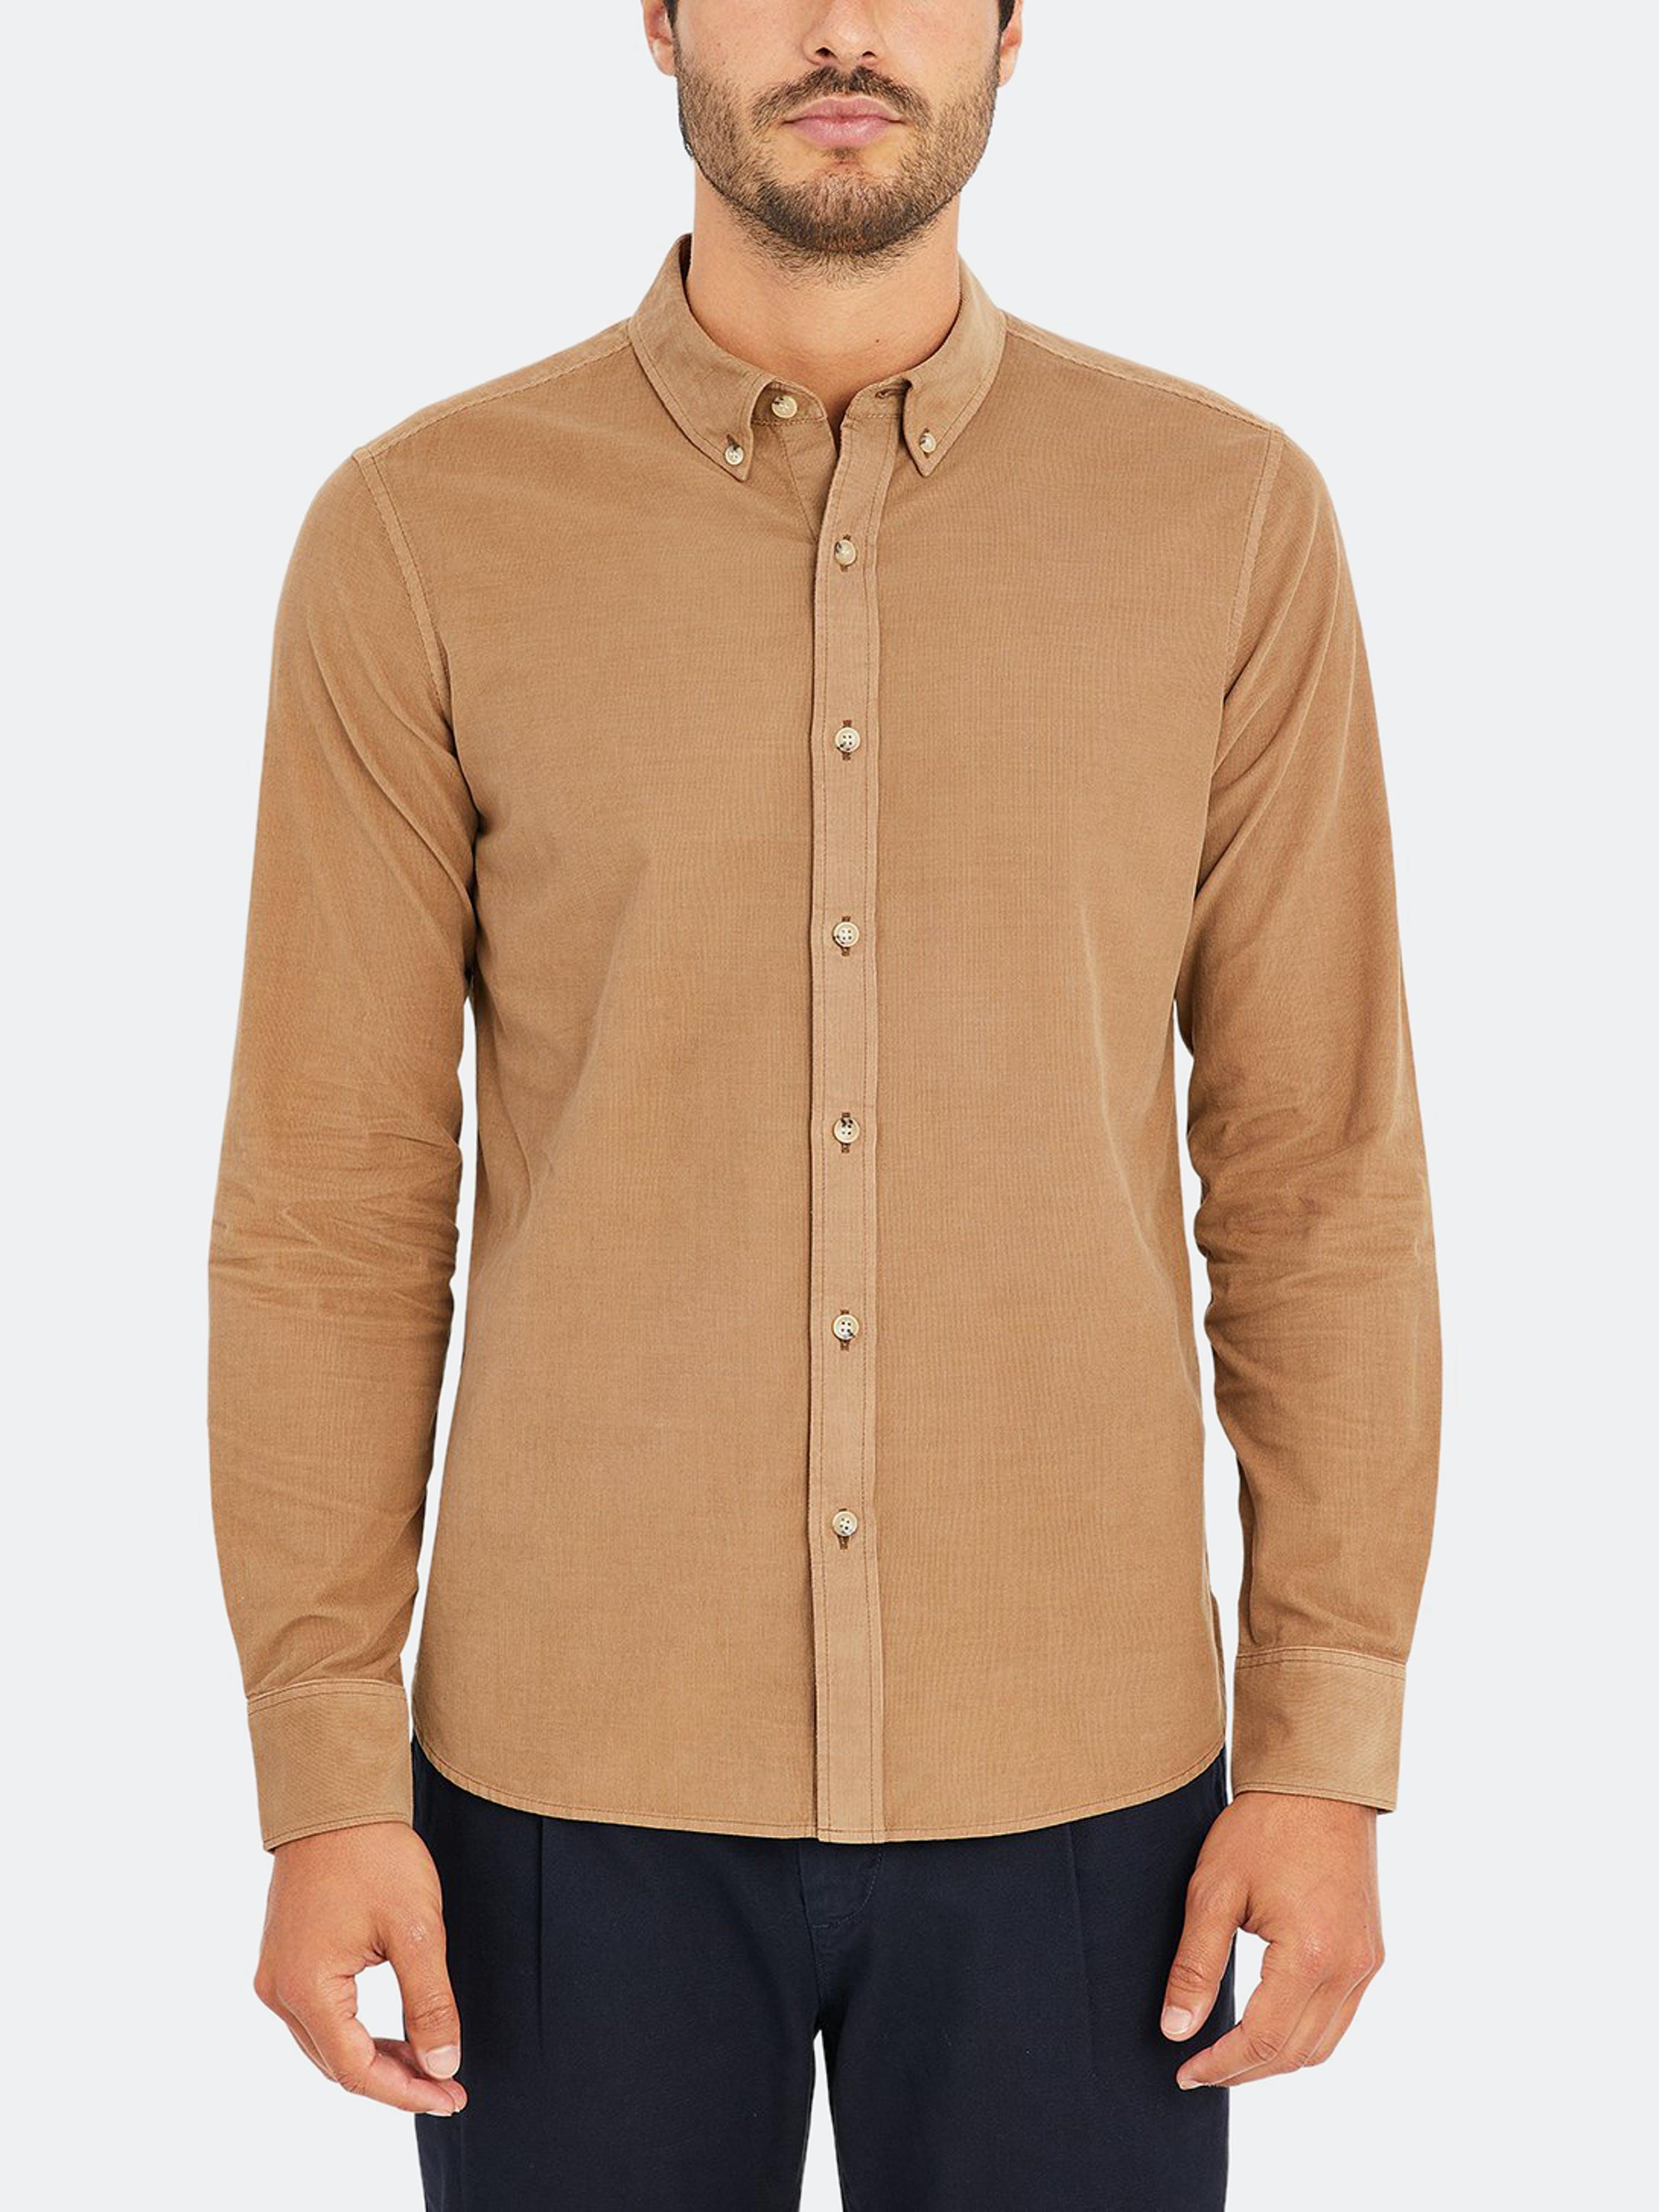 ONS Clothing Fulton Cord Shirt  - Brown